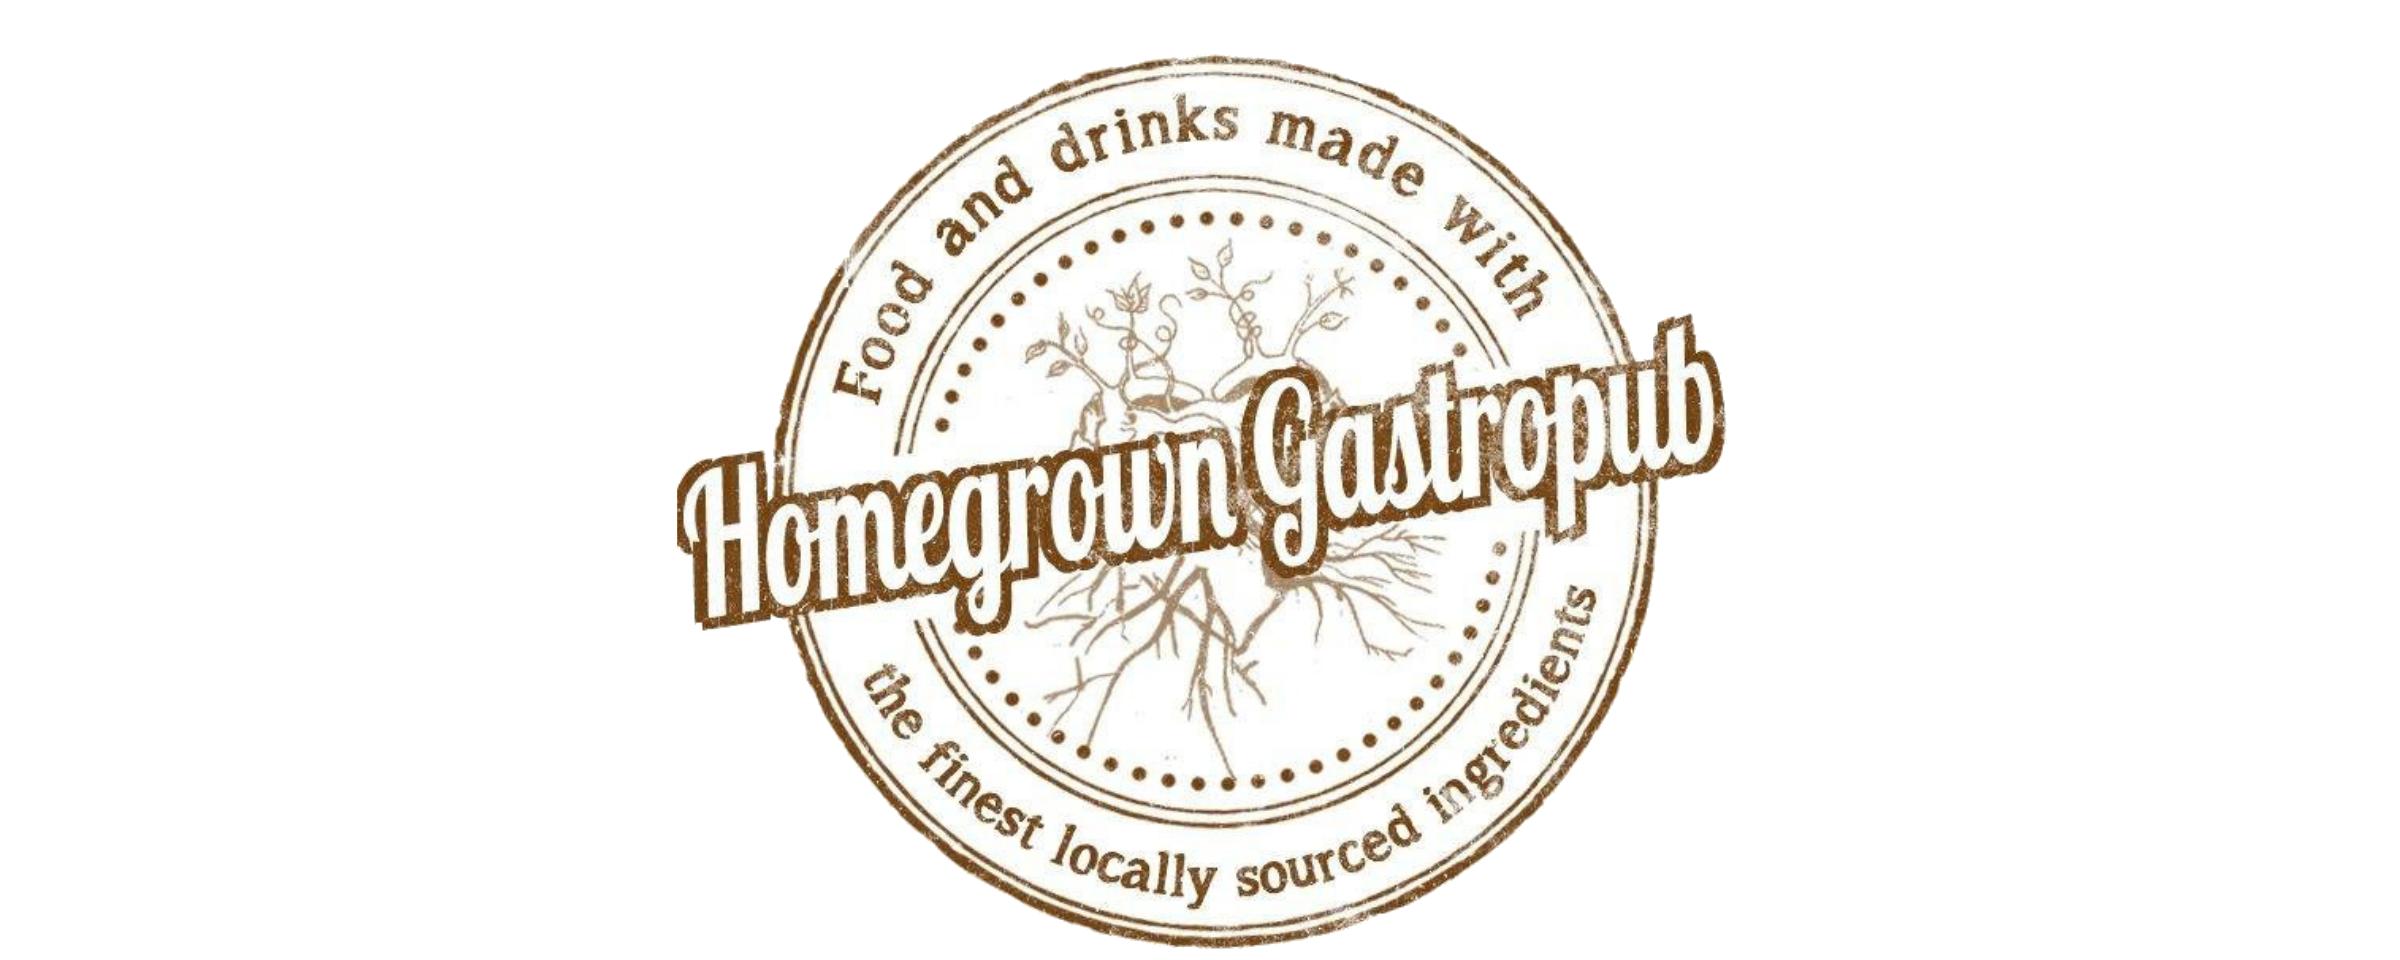 homegrown gastropub 1080x1080.png